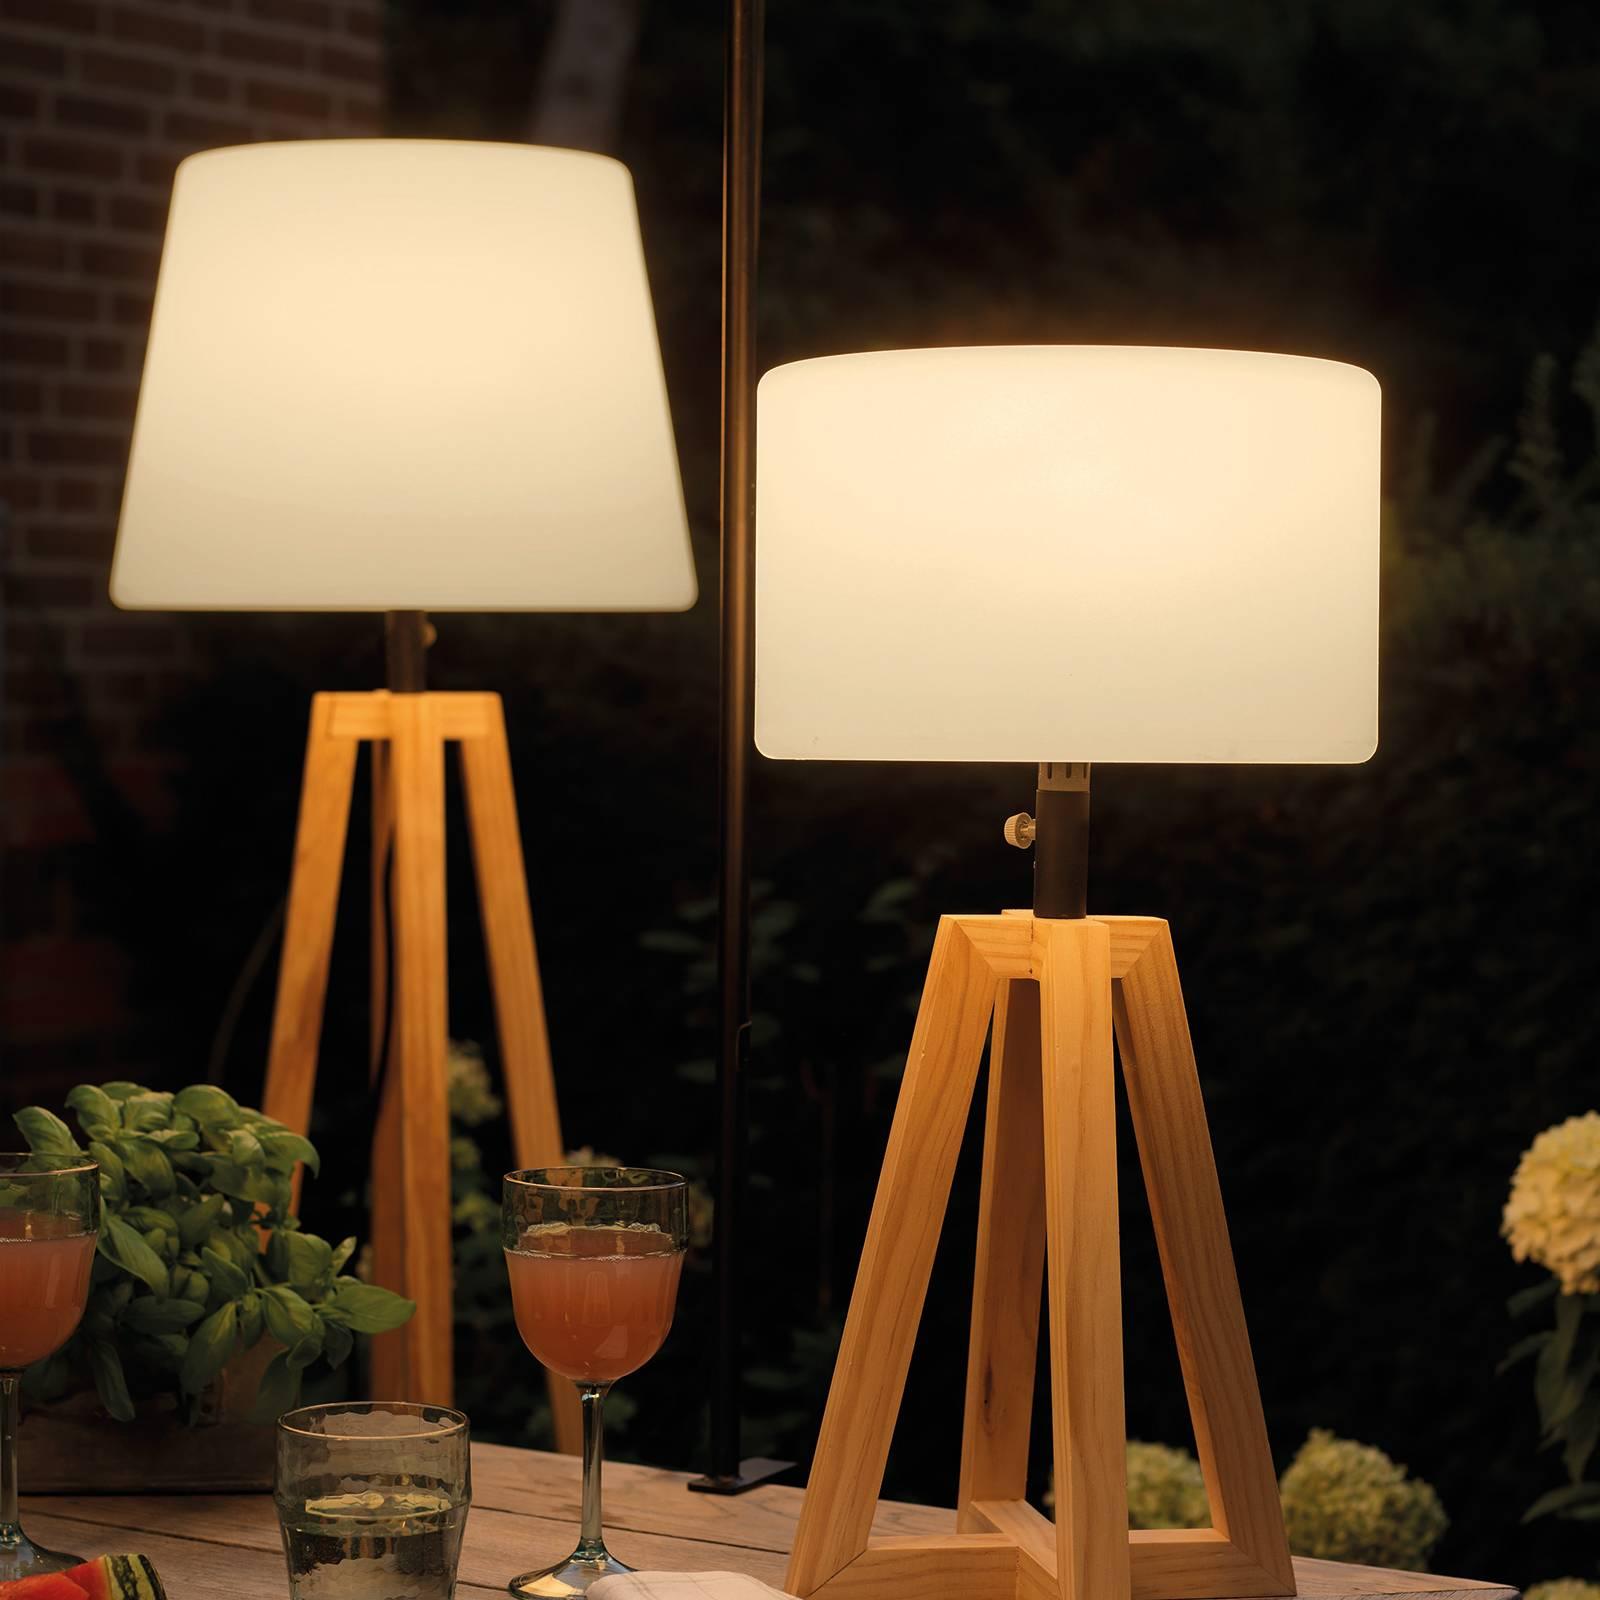 LED solar-vloerlamp 895191 met pijnboomhout-frame